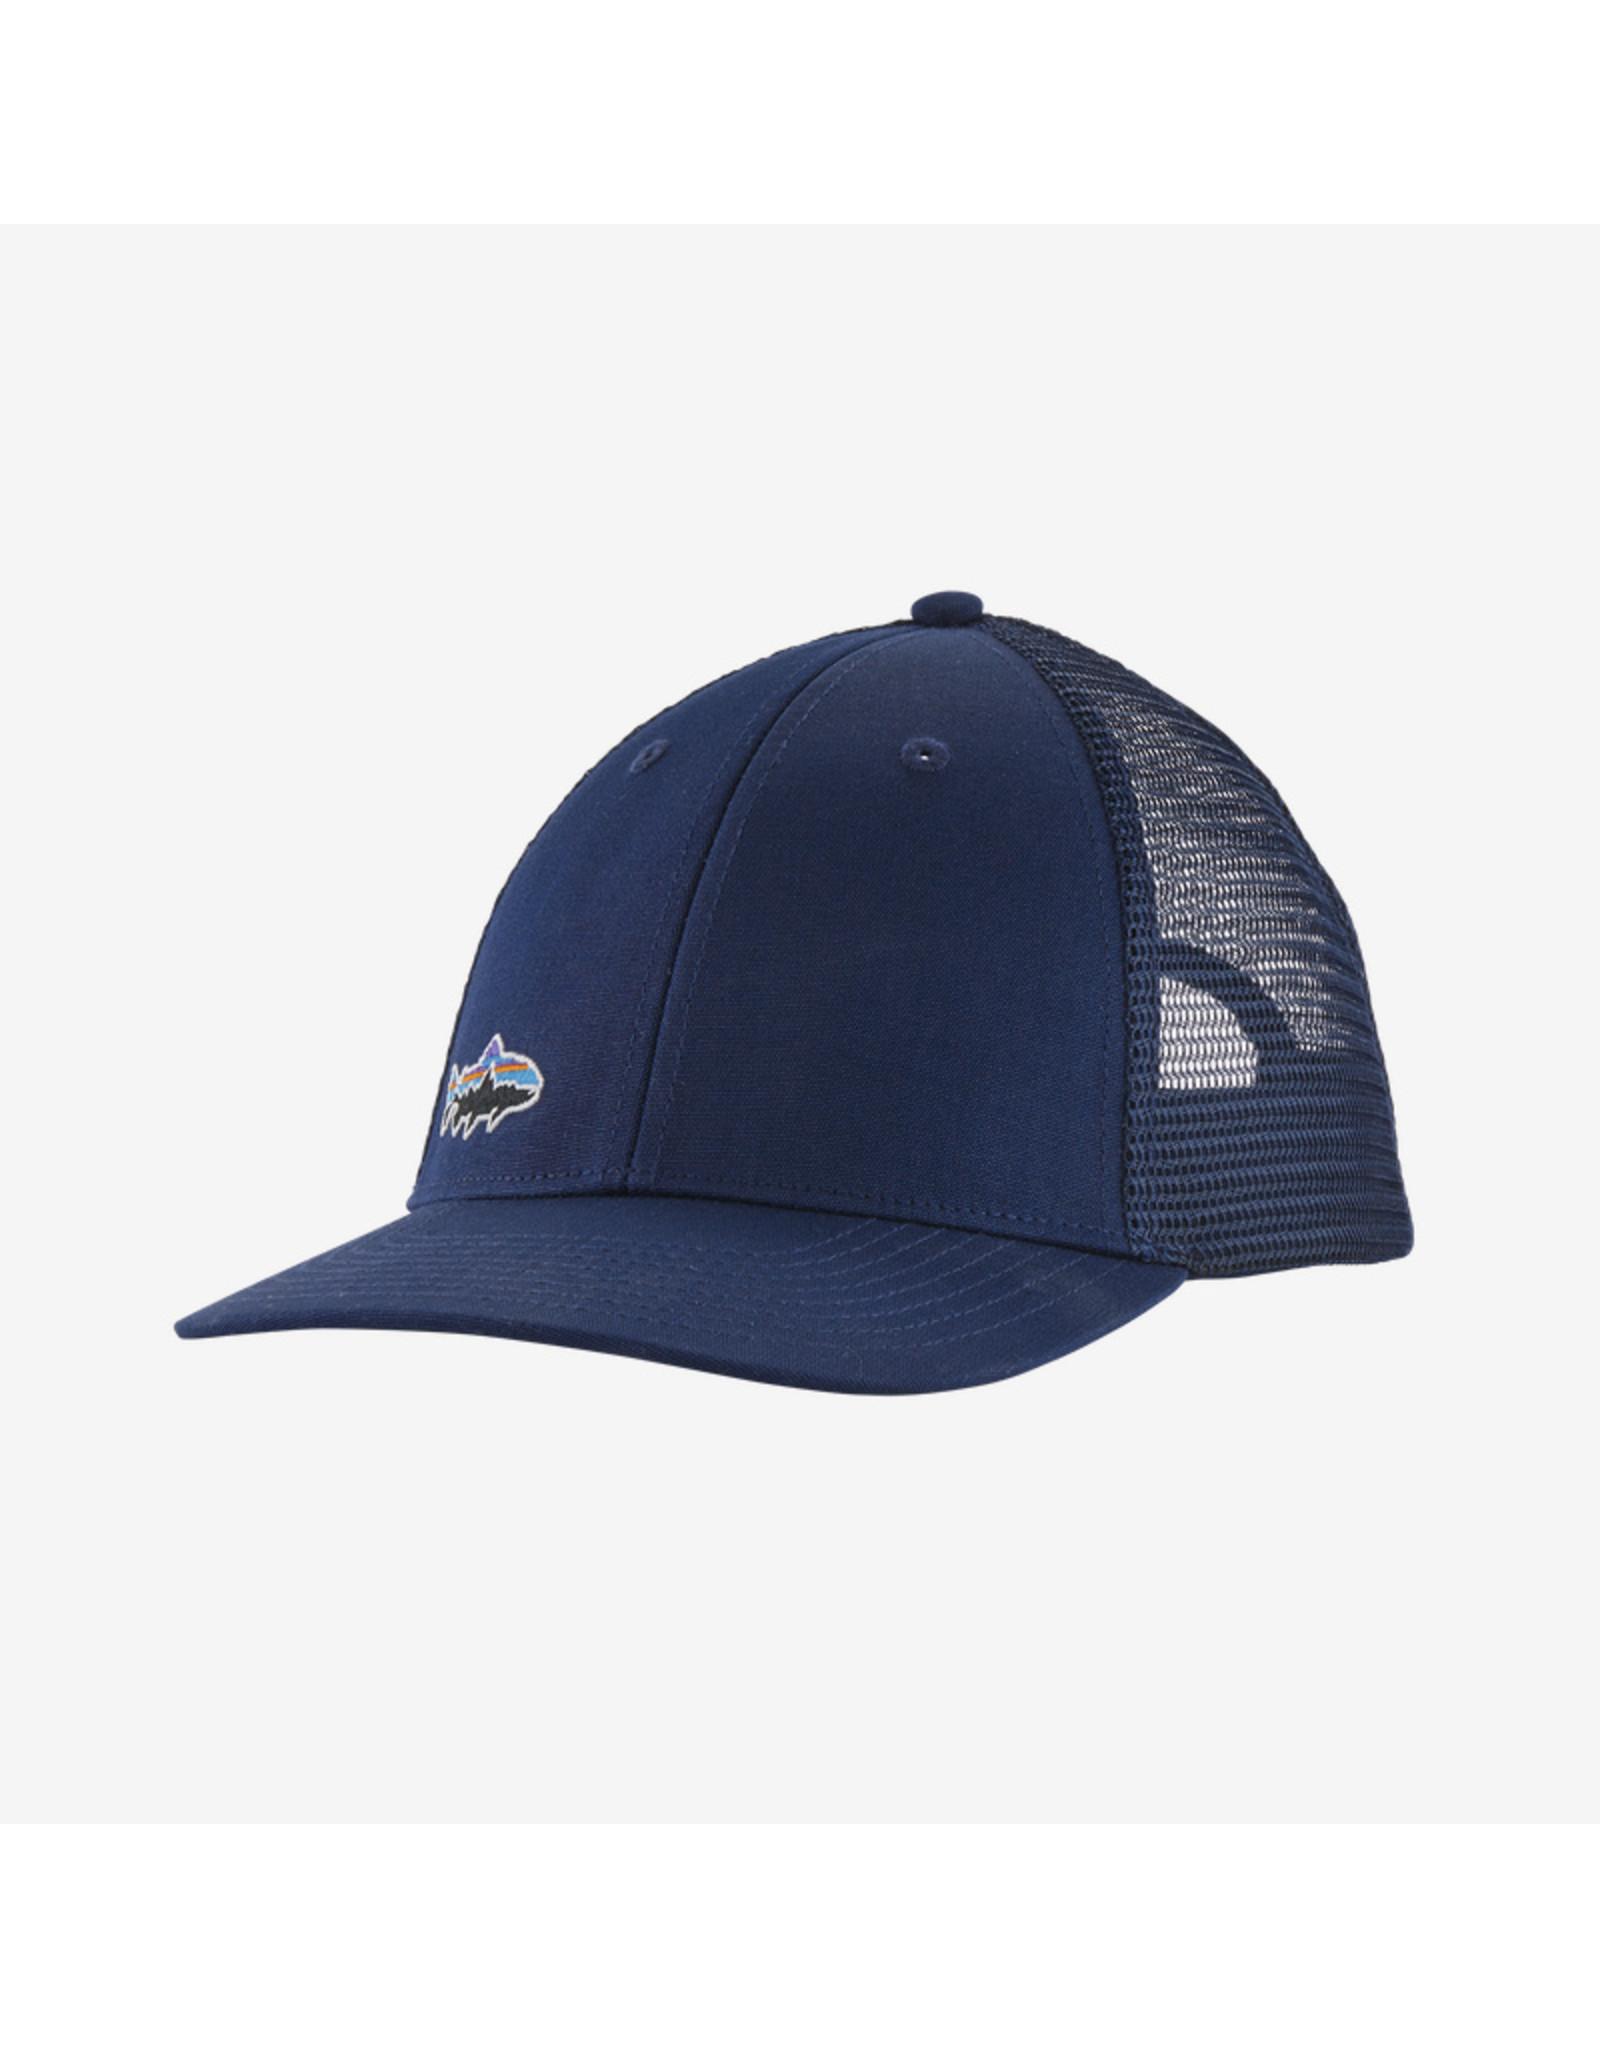 Patagonia Patagonia - Small Fitz Roy Fish LoPro Trucker Hat